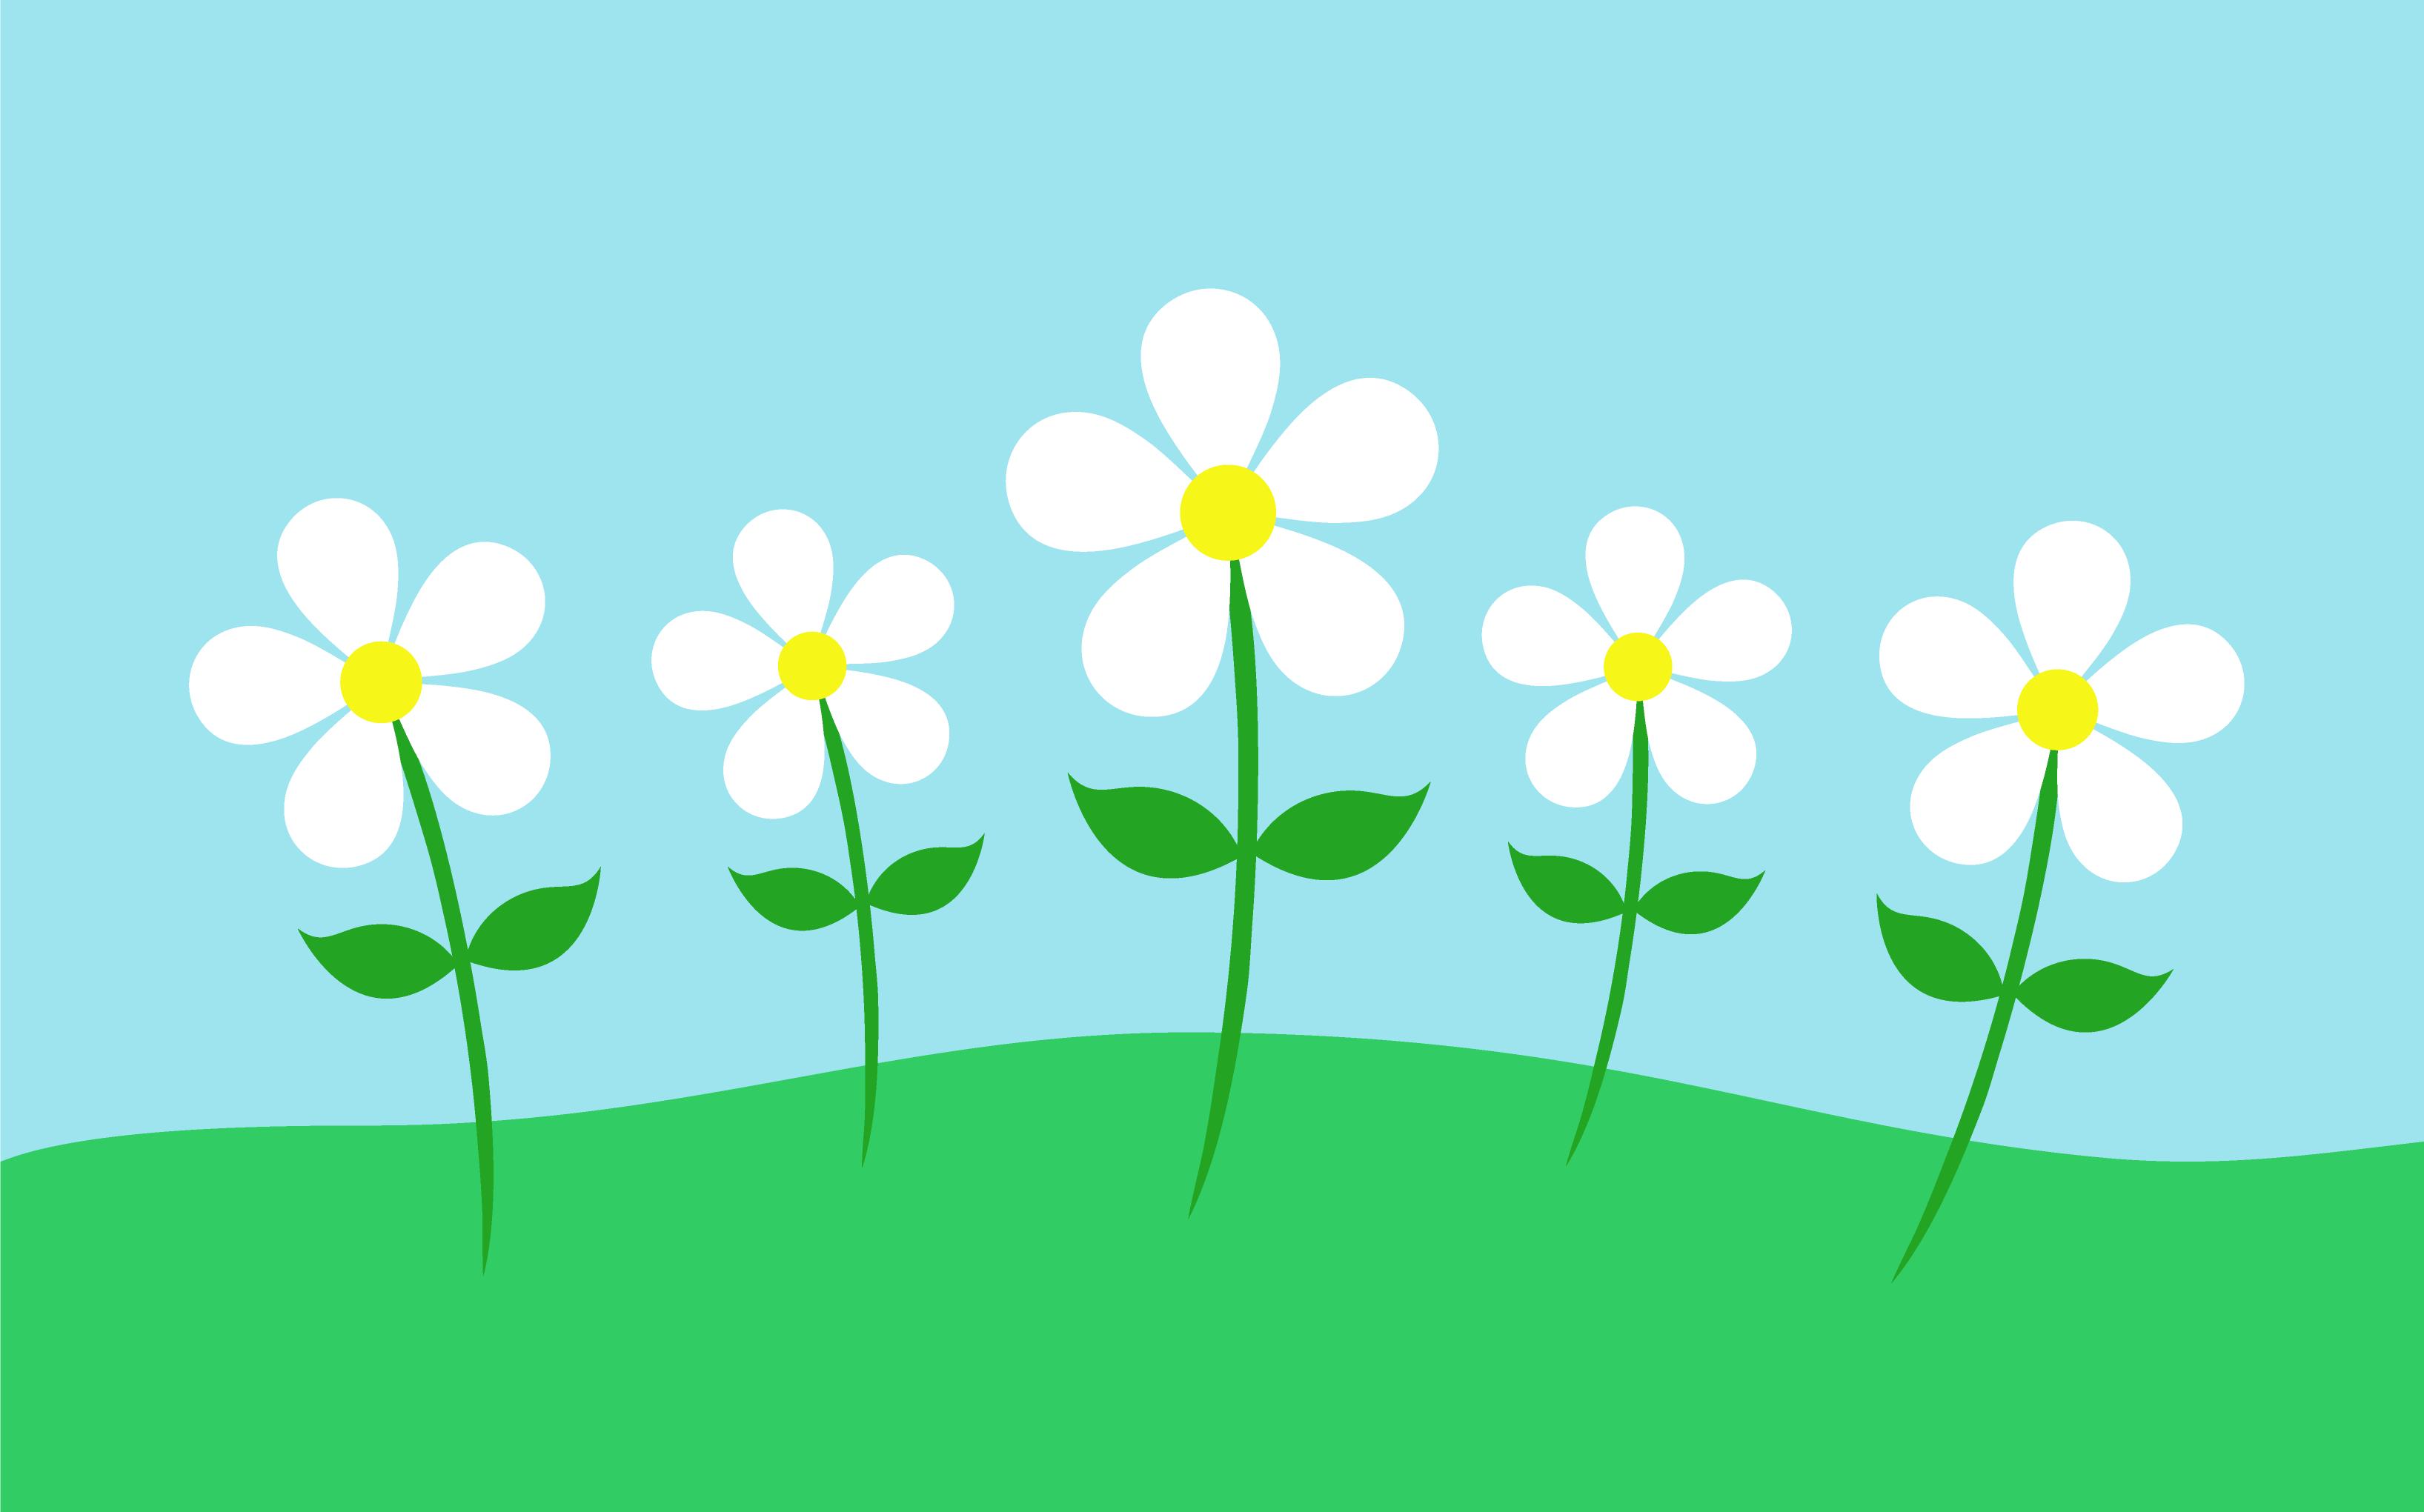 Free Cute Daisy Cliparts, Download Free Clip Art, Free Clip.